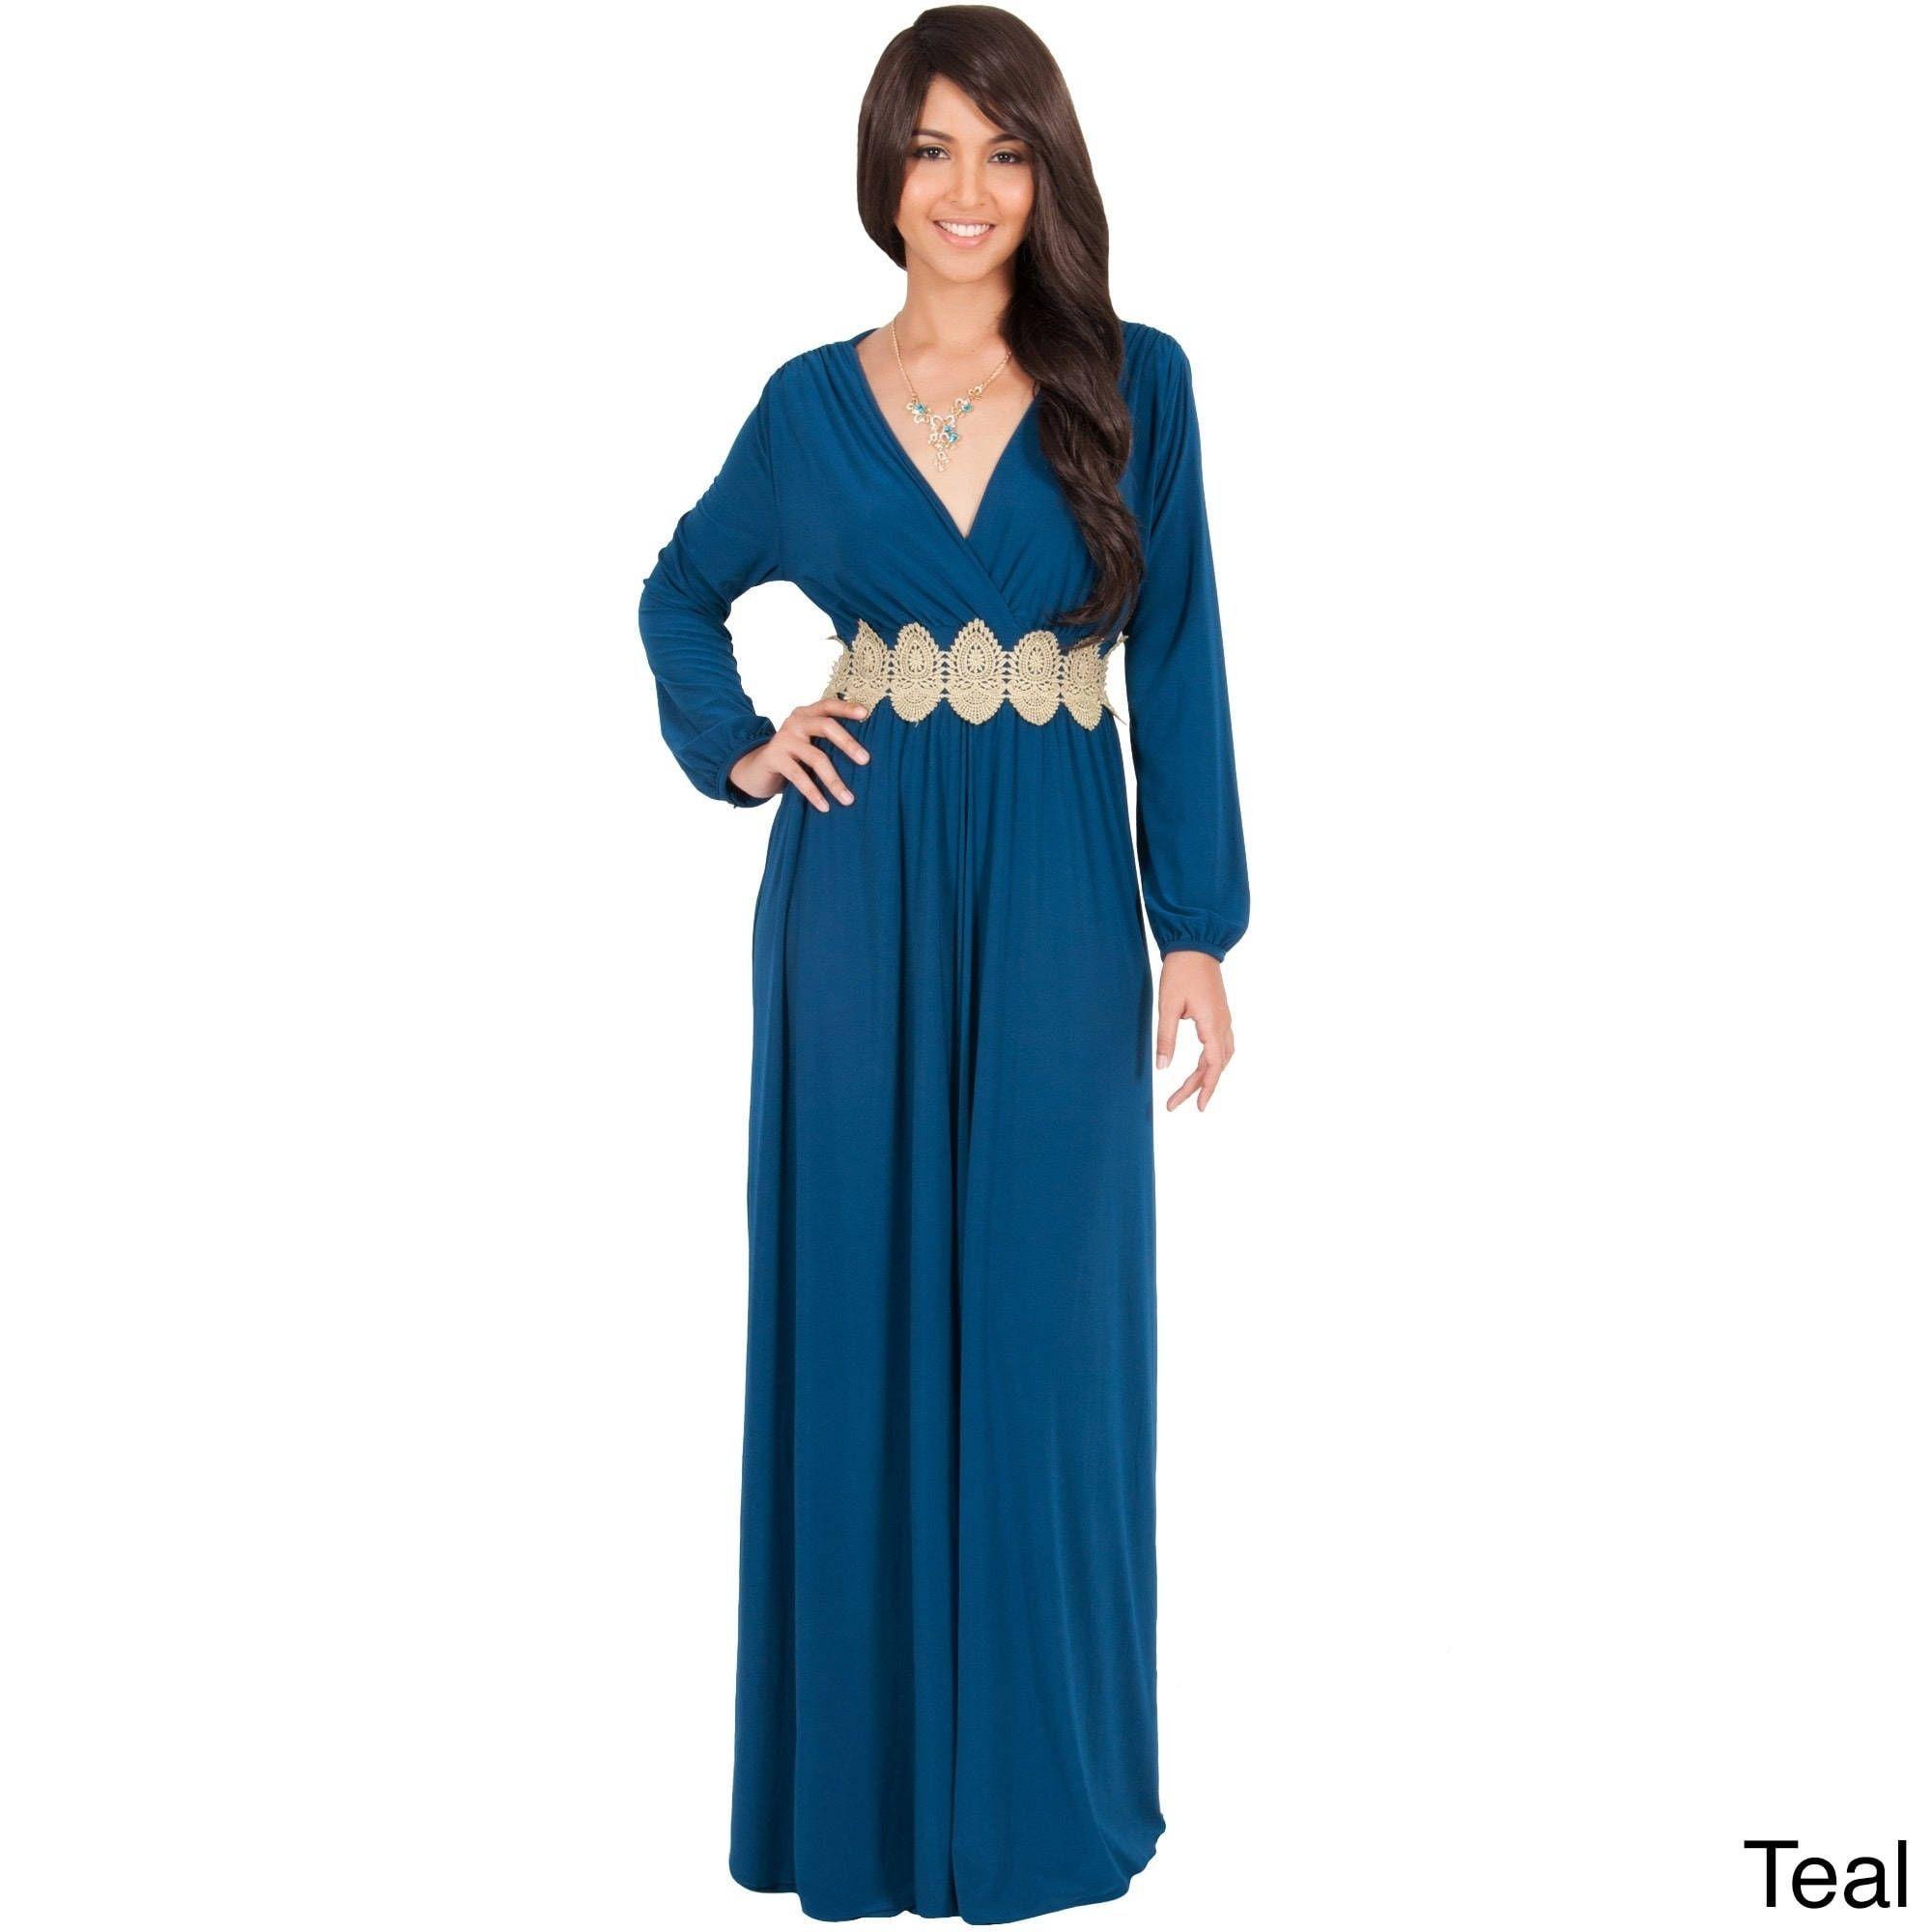 Global koh koh womenus longsleeve vneck maxi dress fashion